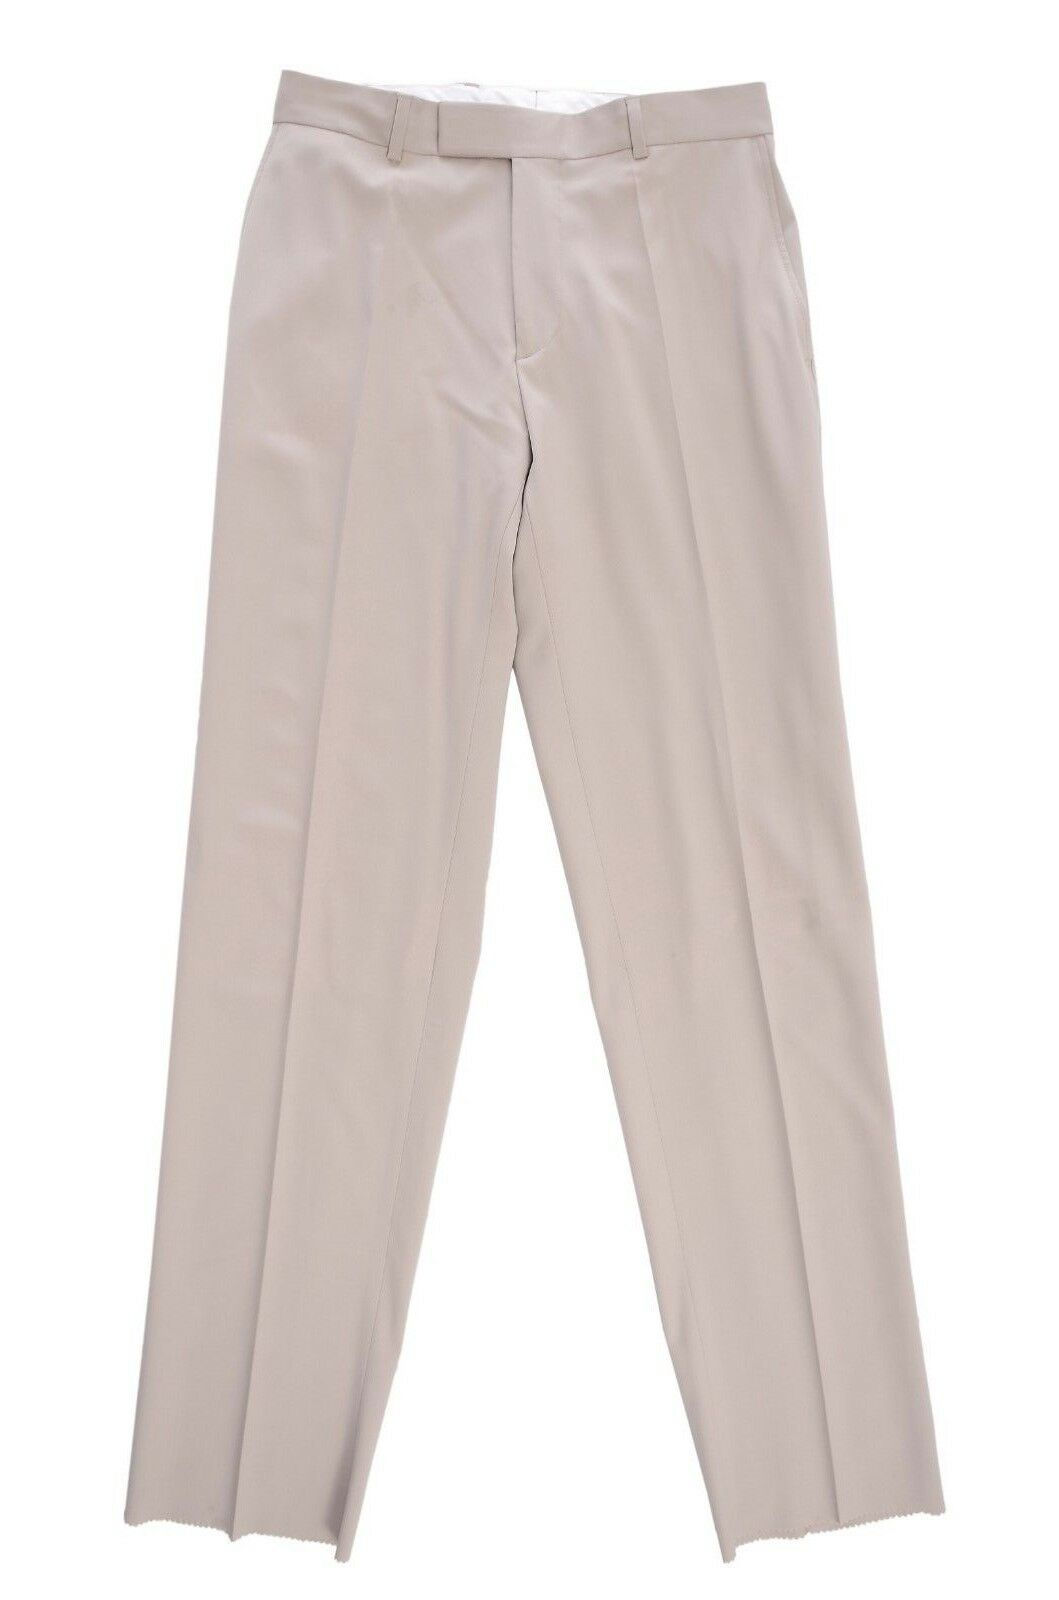 New Hugo Boss 32W Tan Light Brown James Dress Pants 100% Wool